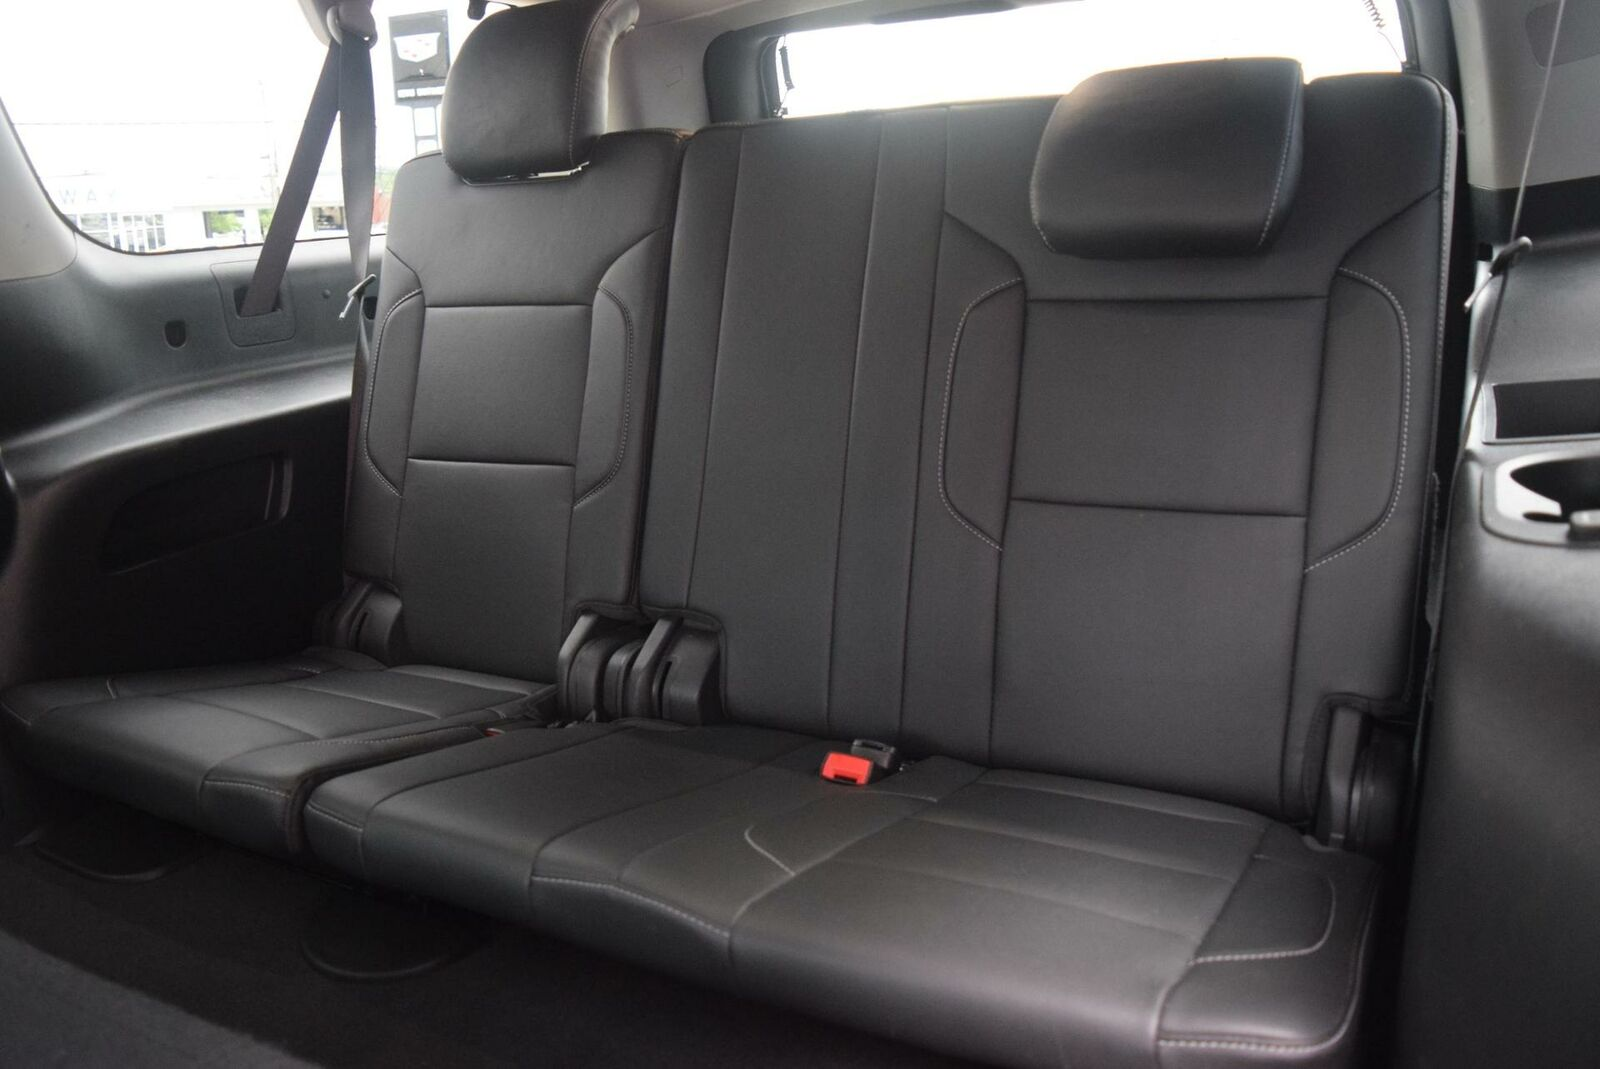 Chevrolet Suburban 2019 photo 10